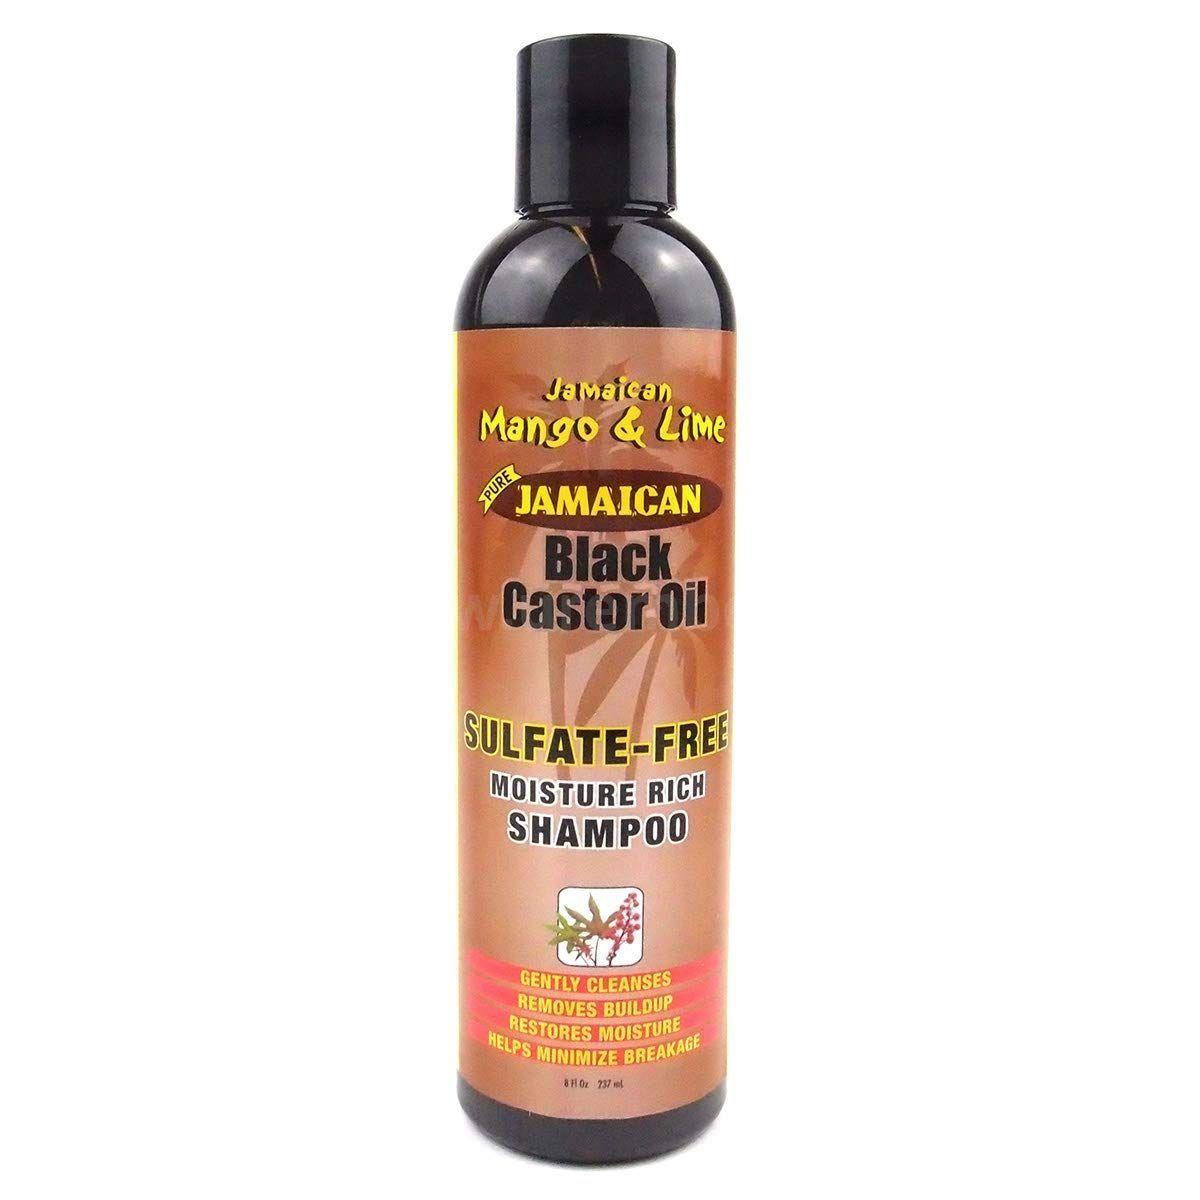 Jamaican Mango & Lime Black Castor Oil Sulfate Free Shampoo - 8oz